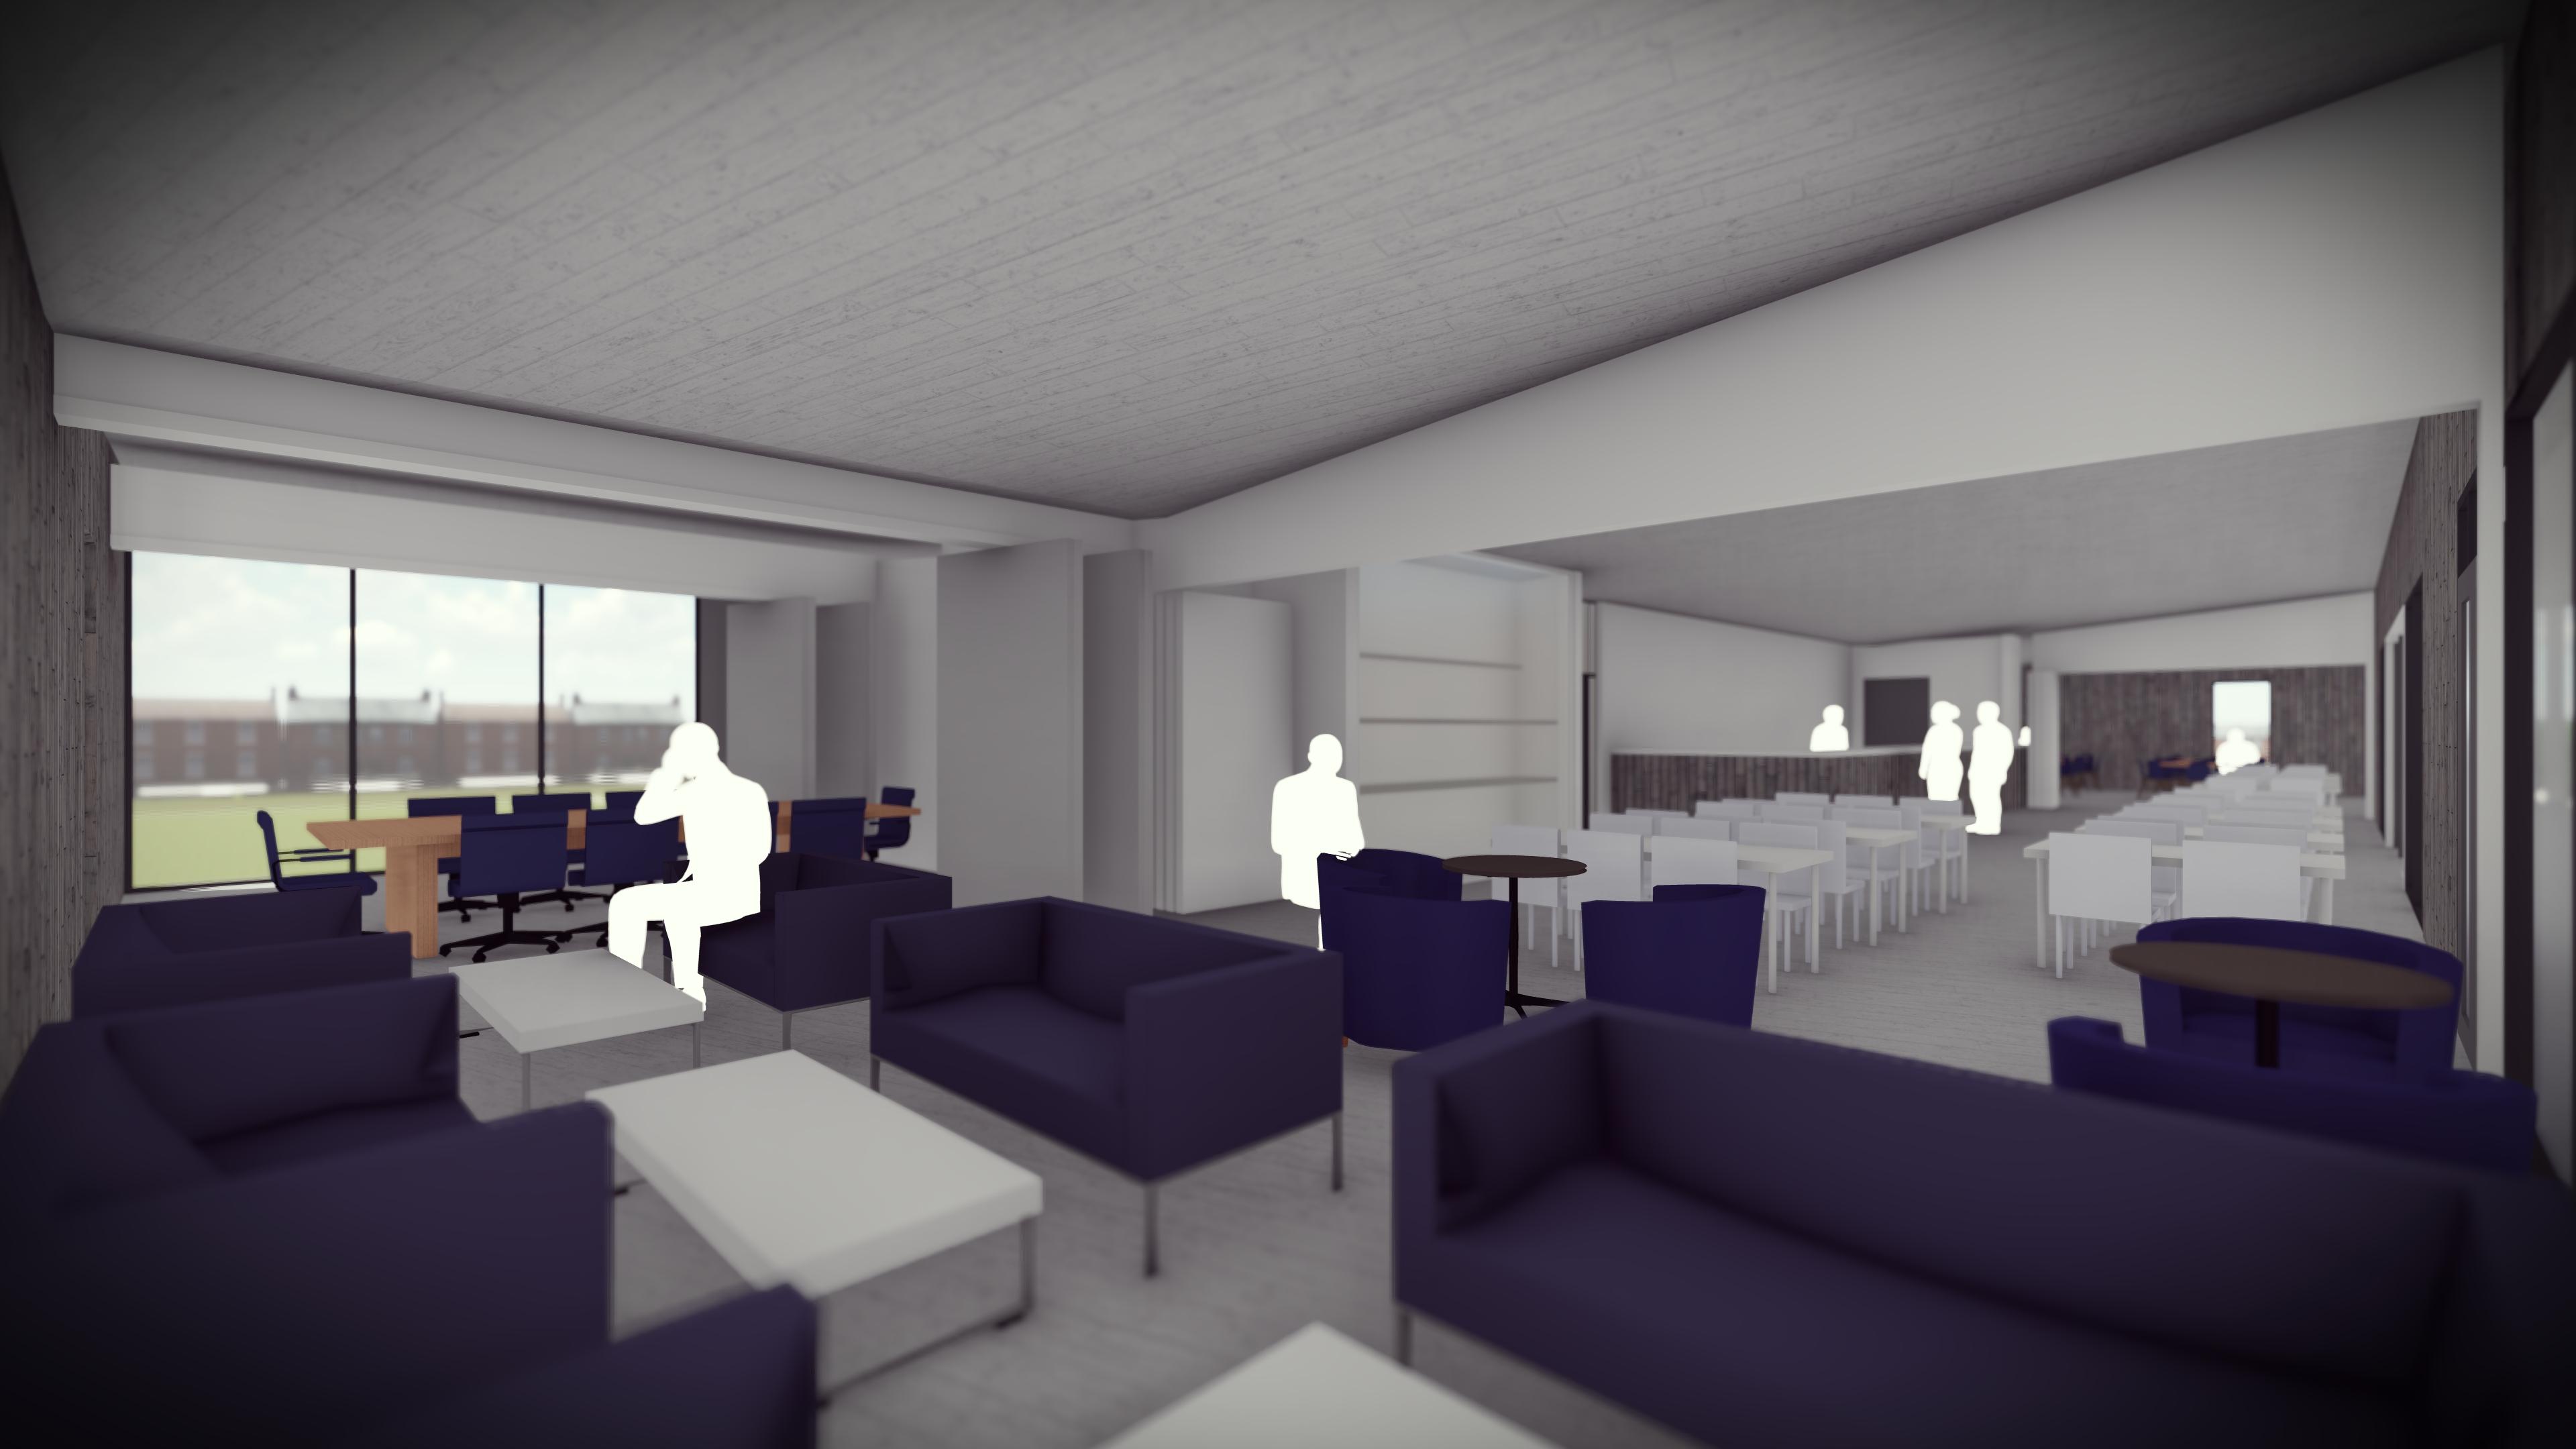 http://www.studio-hive.co.uk/wp-content/uploads/2019/01/WSM-RFC-CGI-Grandstand_16-Photo.jpg